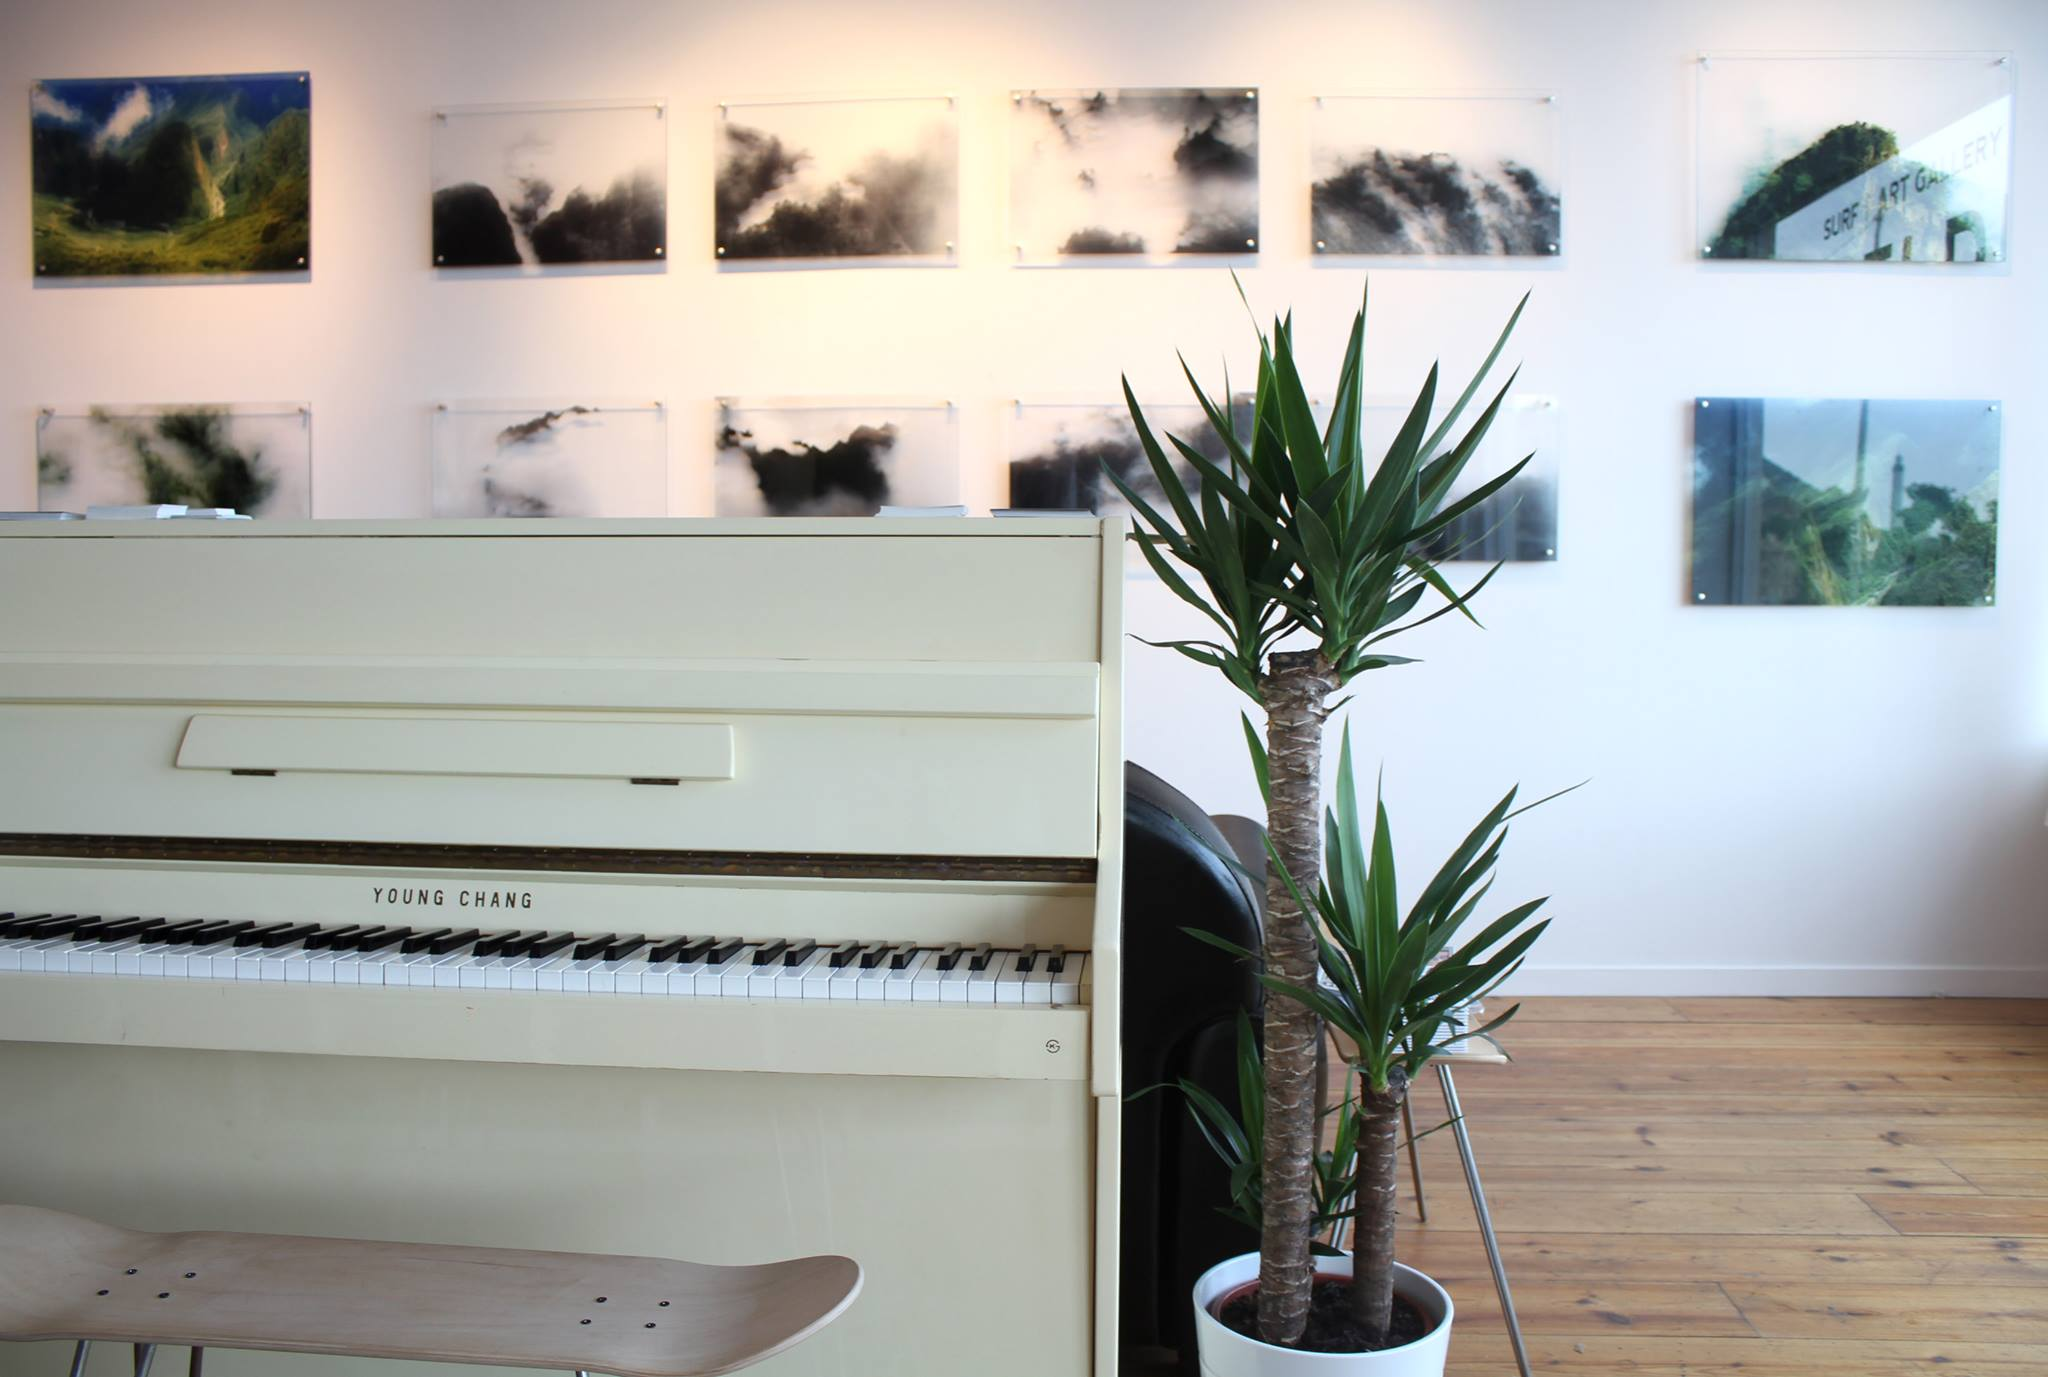 Helder ouvre son Beach Store à Biarritz